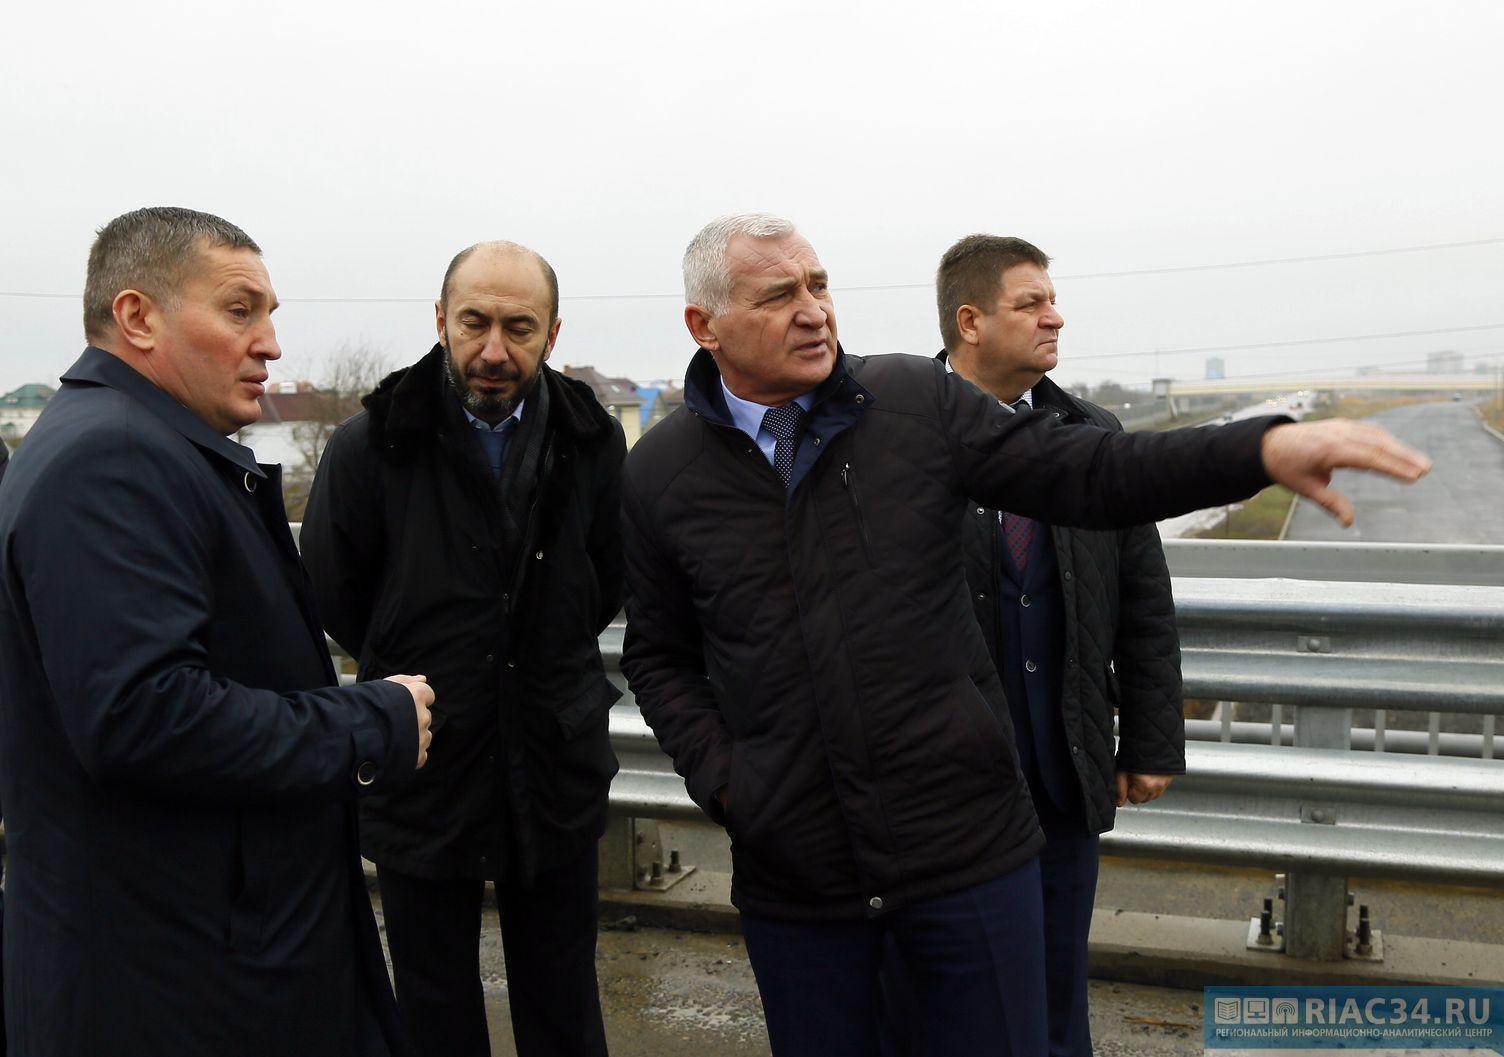 Движение помосту через Ахтубу будет запущено— Андрей Бочаров